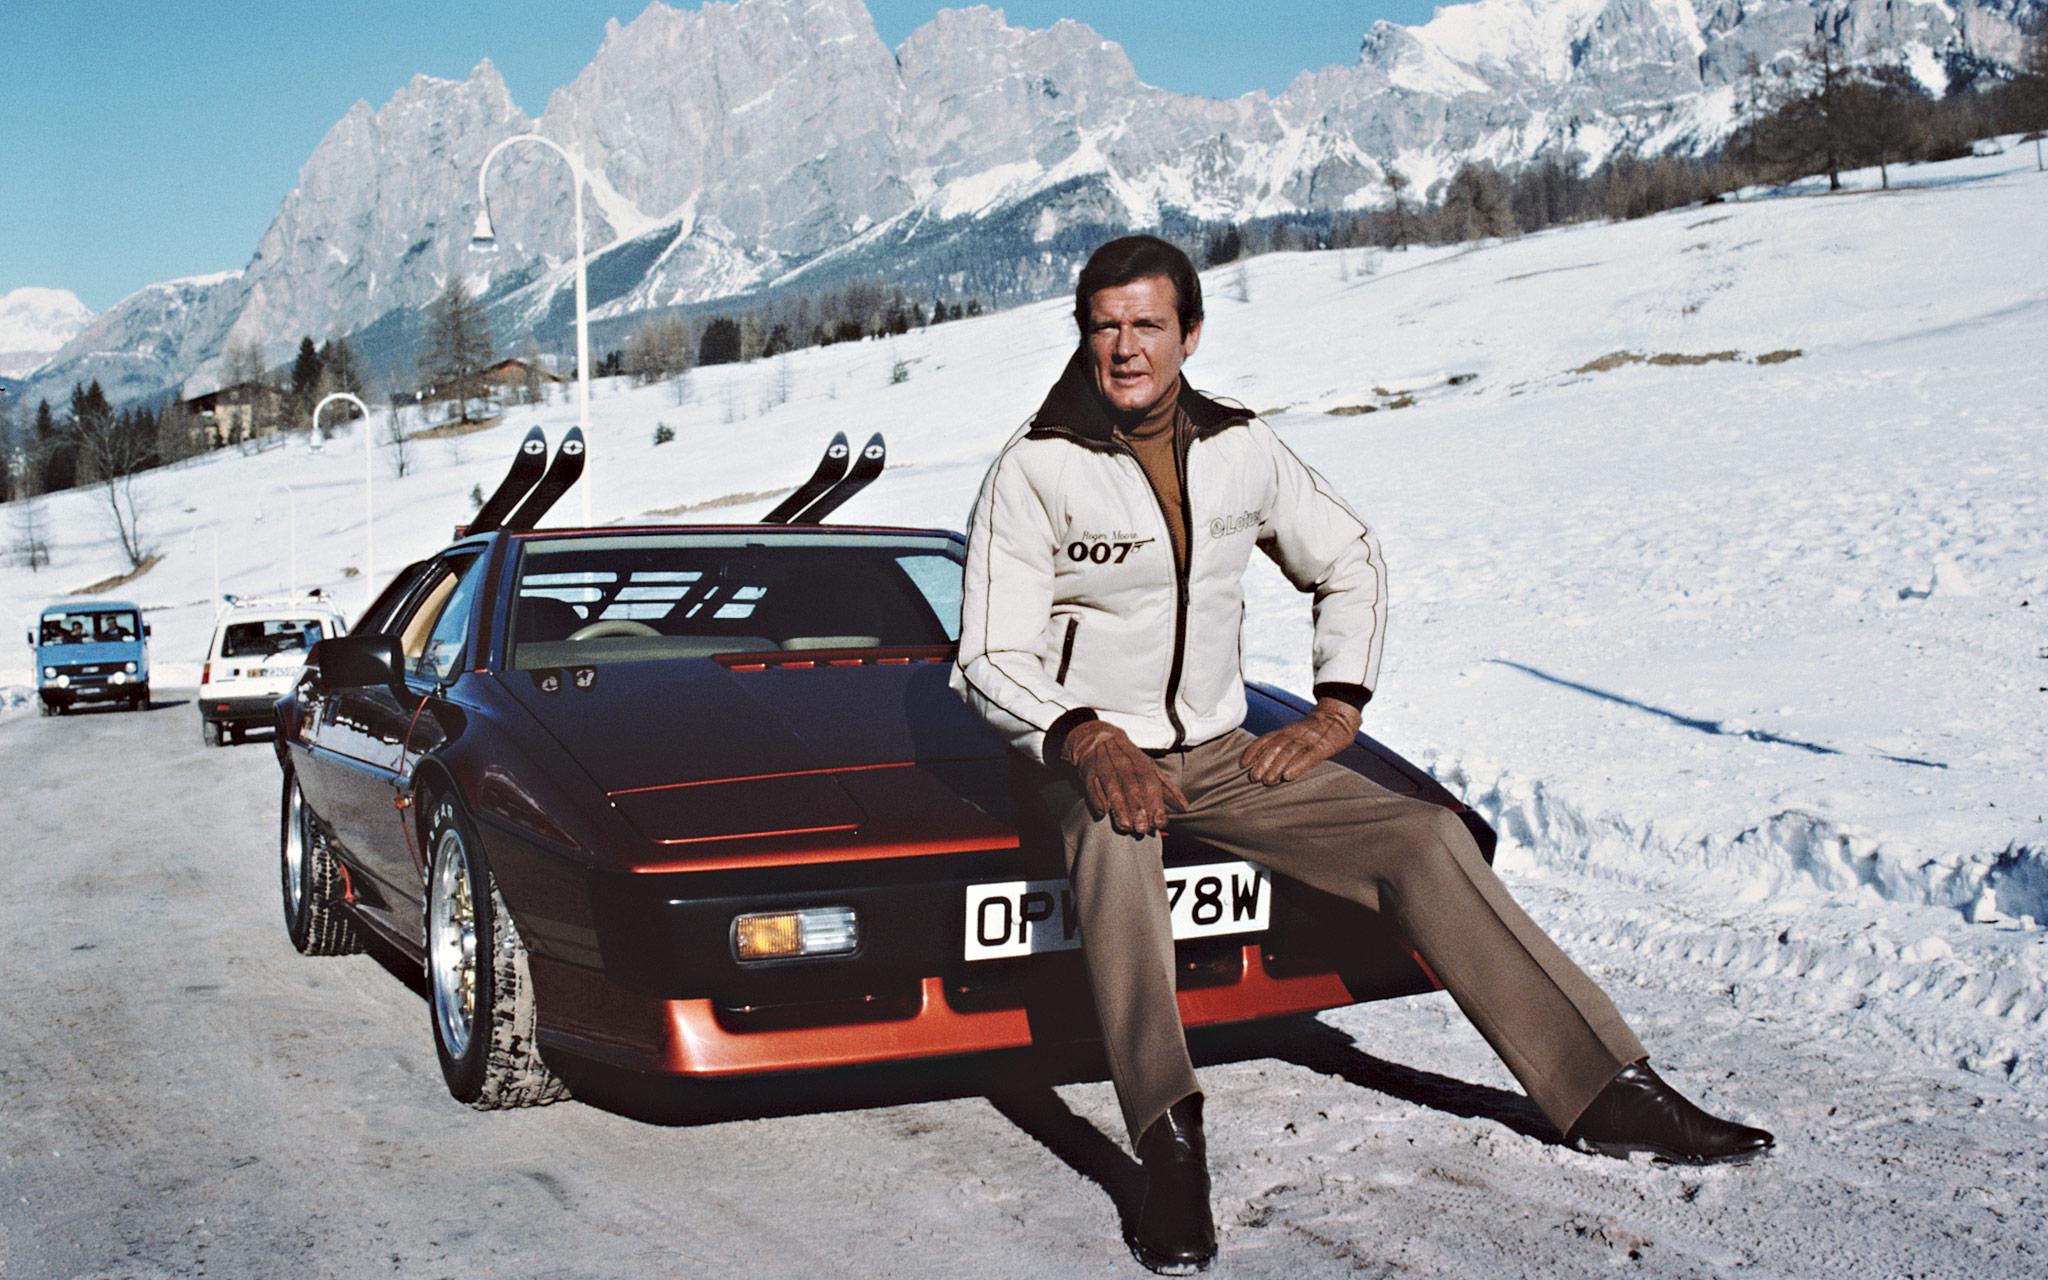 Roger Moore as James Bond astride a Lotus Esprit Turbo